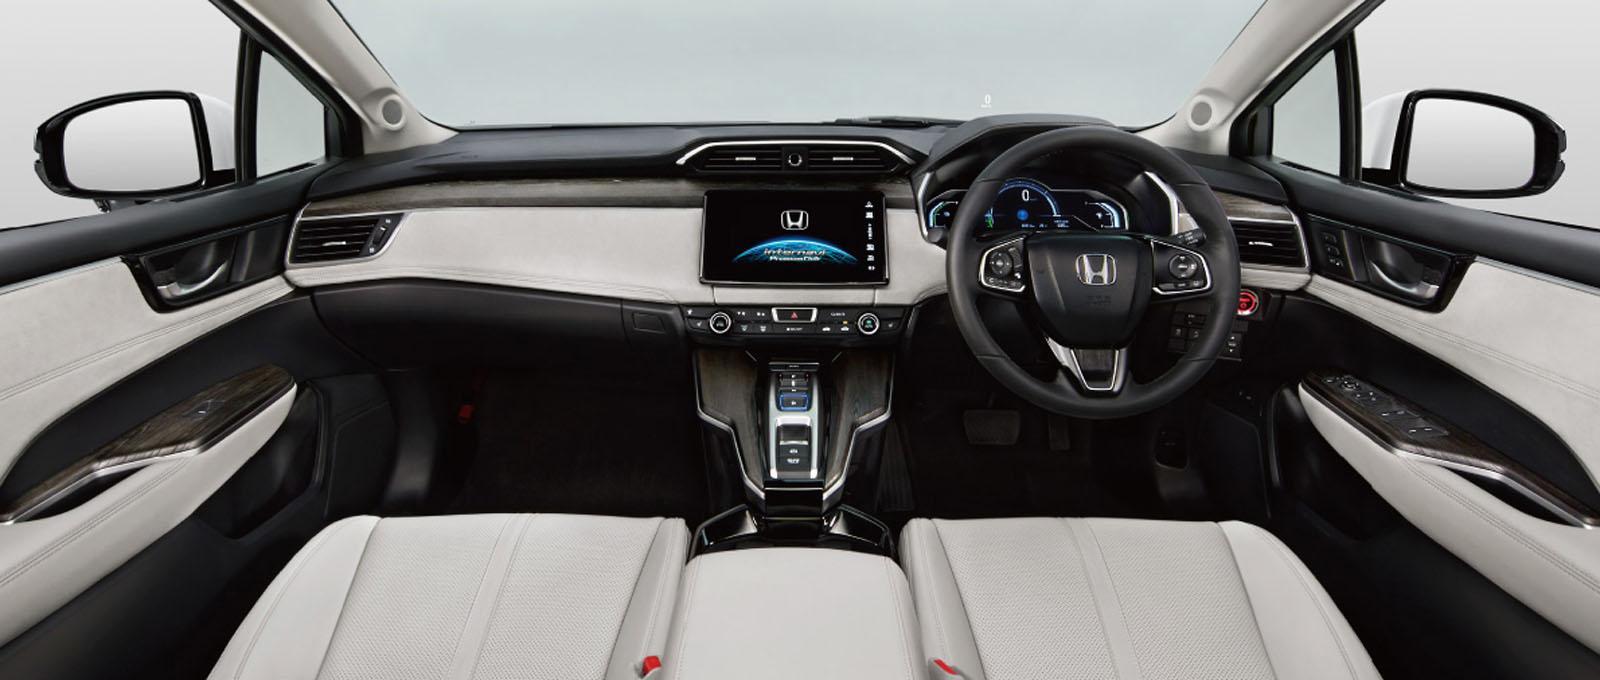 [Image: S0-Honda-devoile-la-version-de-productio...363307.jpg]